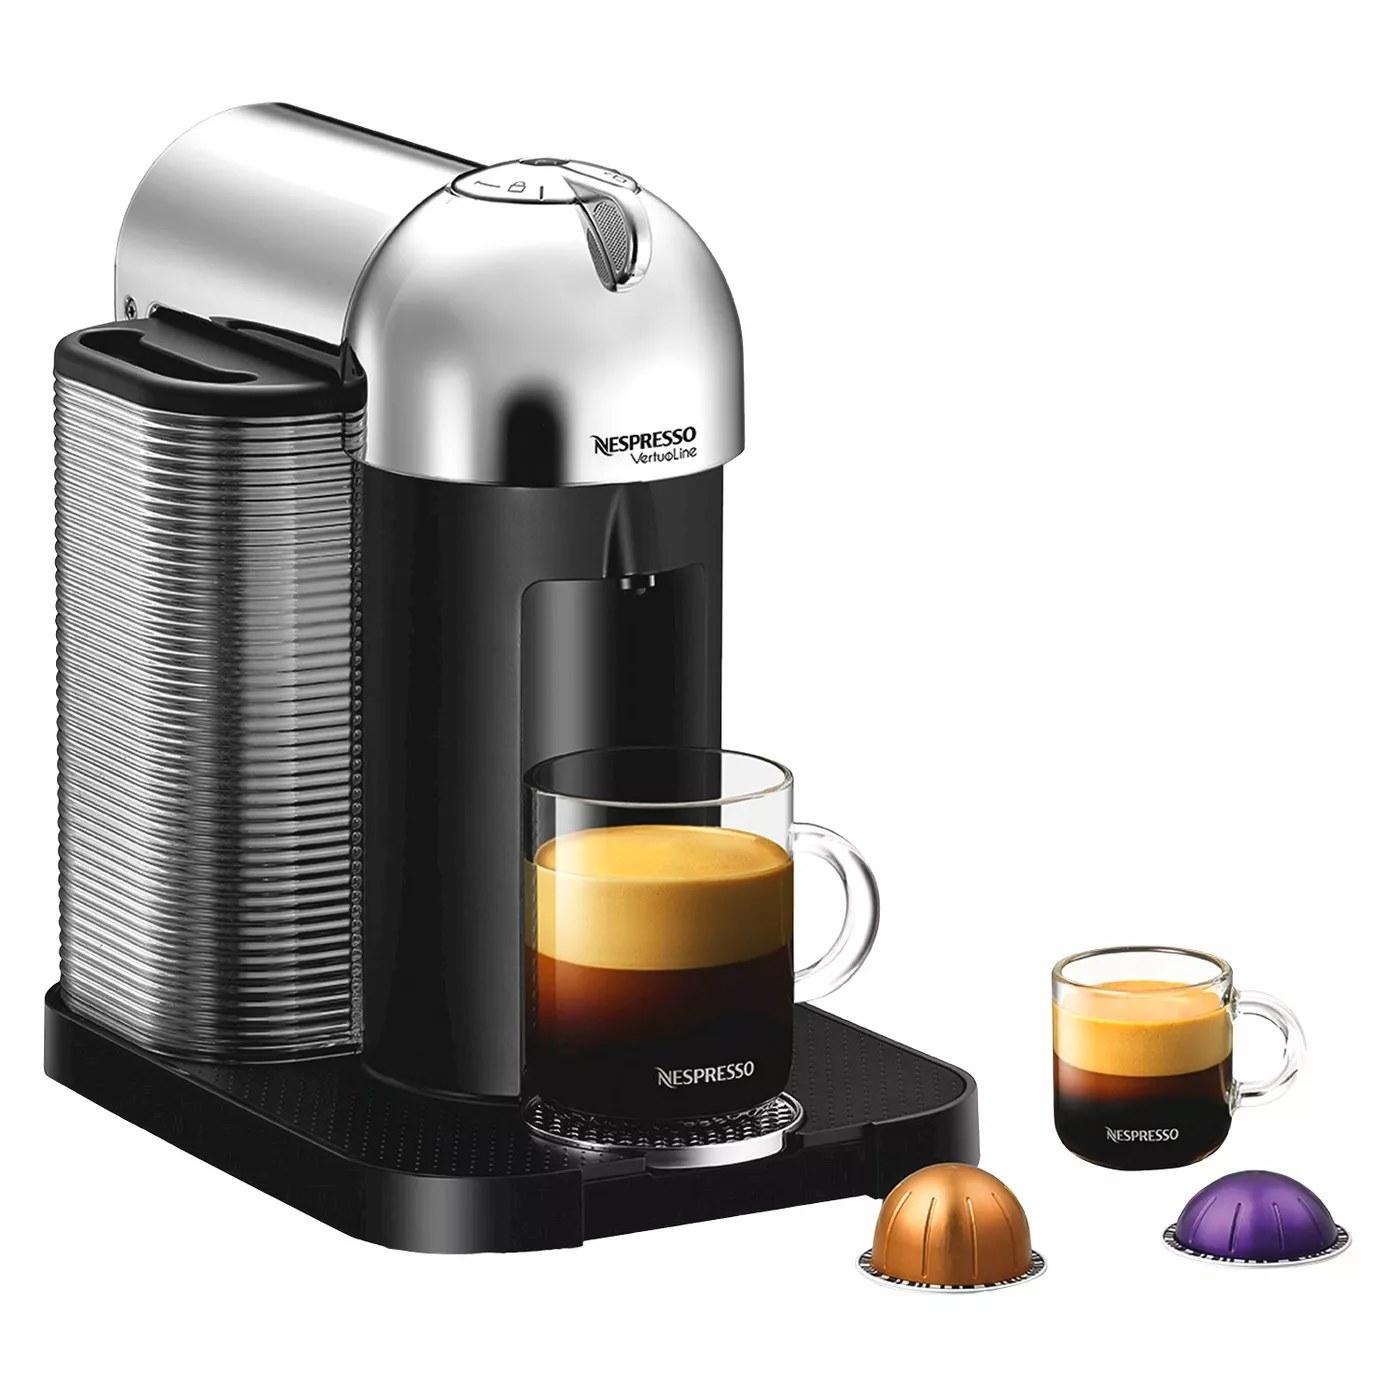 The Nespresso machine making a caffeinated beverage